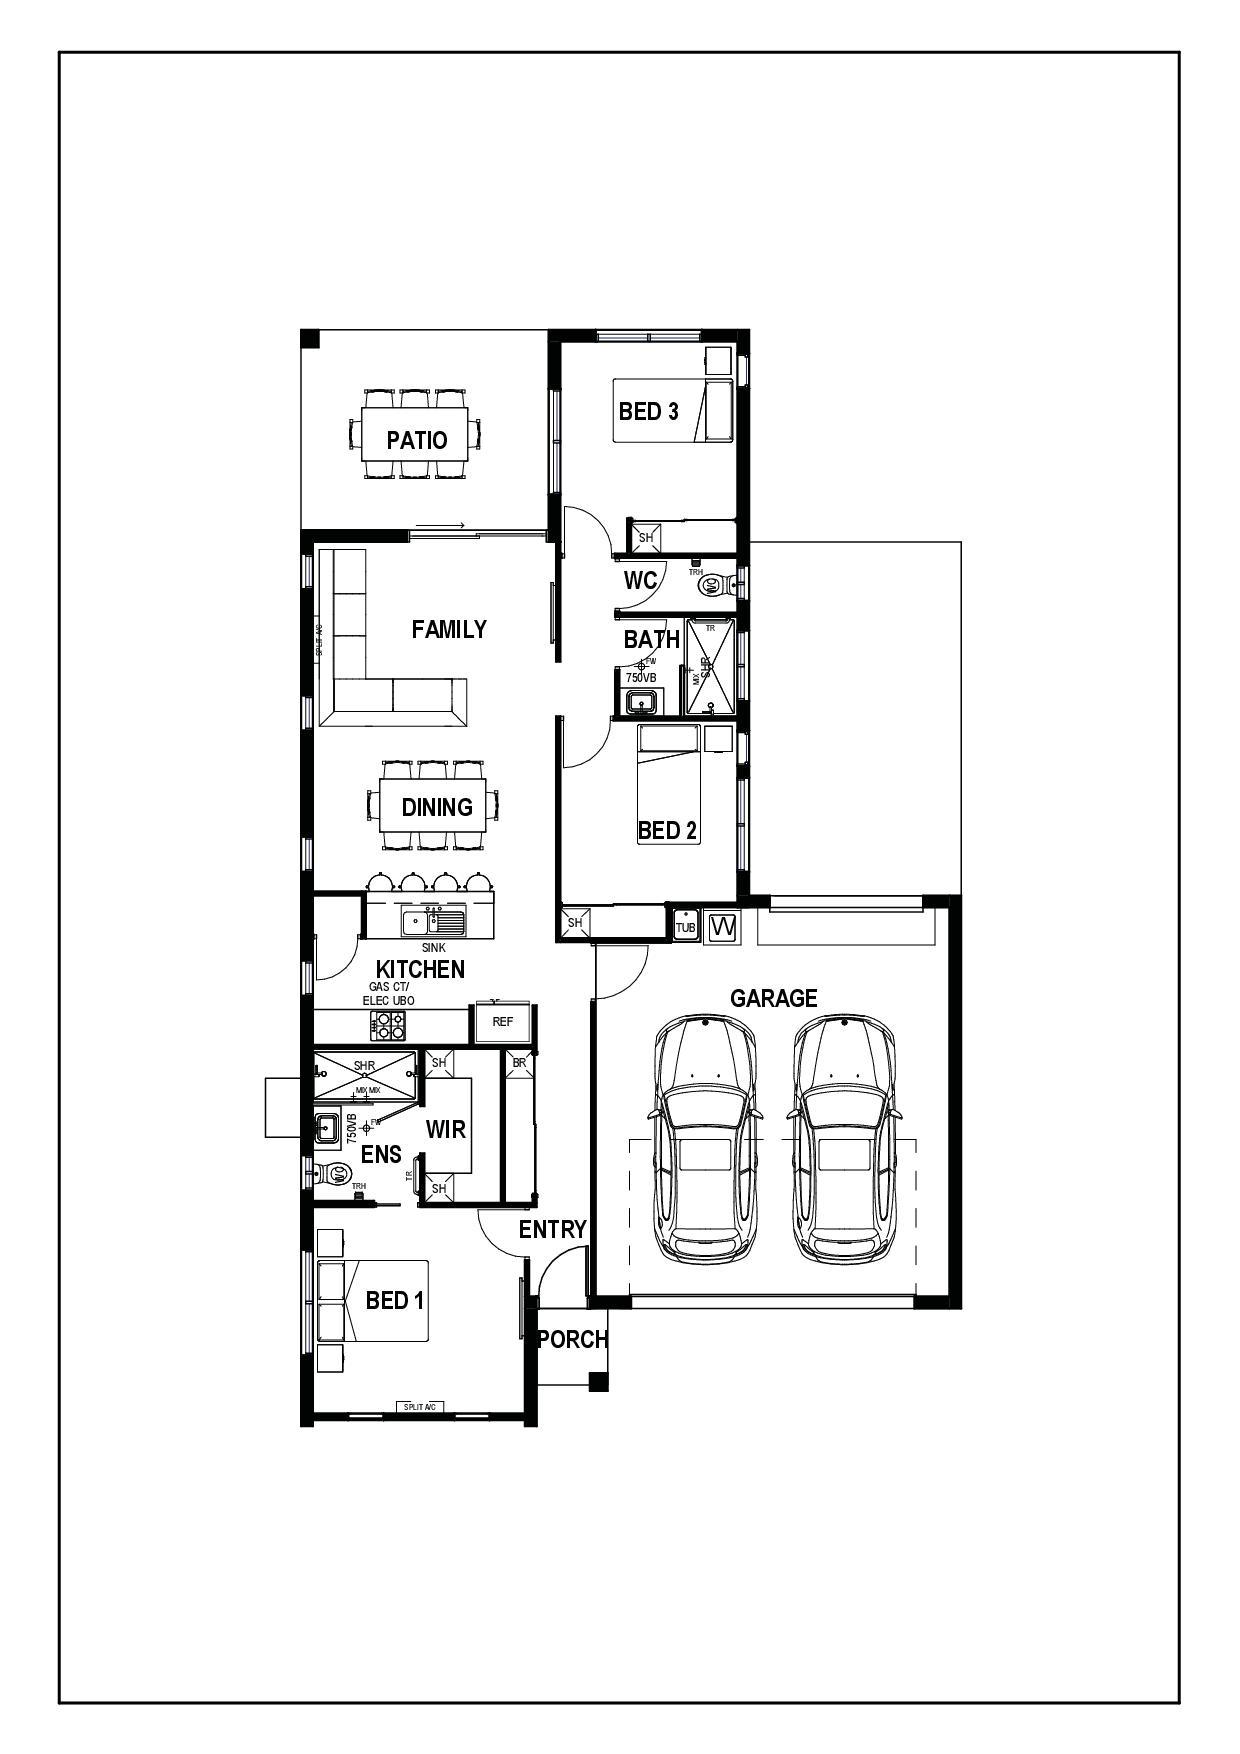 Carramar AD - 17 Floor Plan.jpg